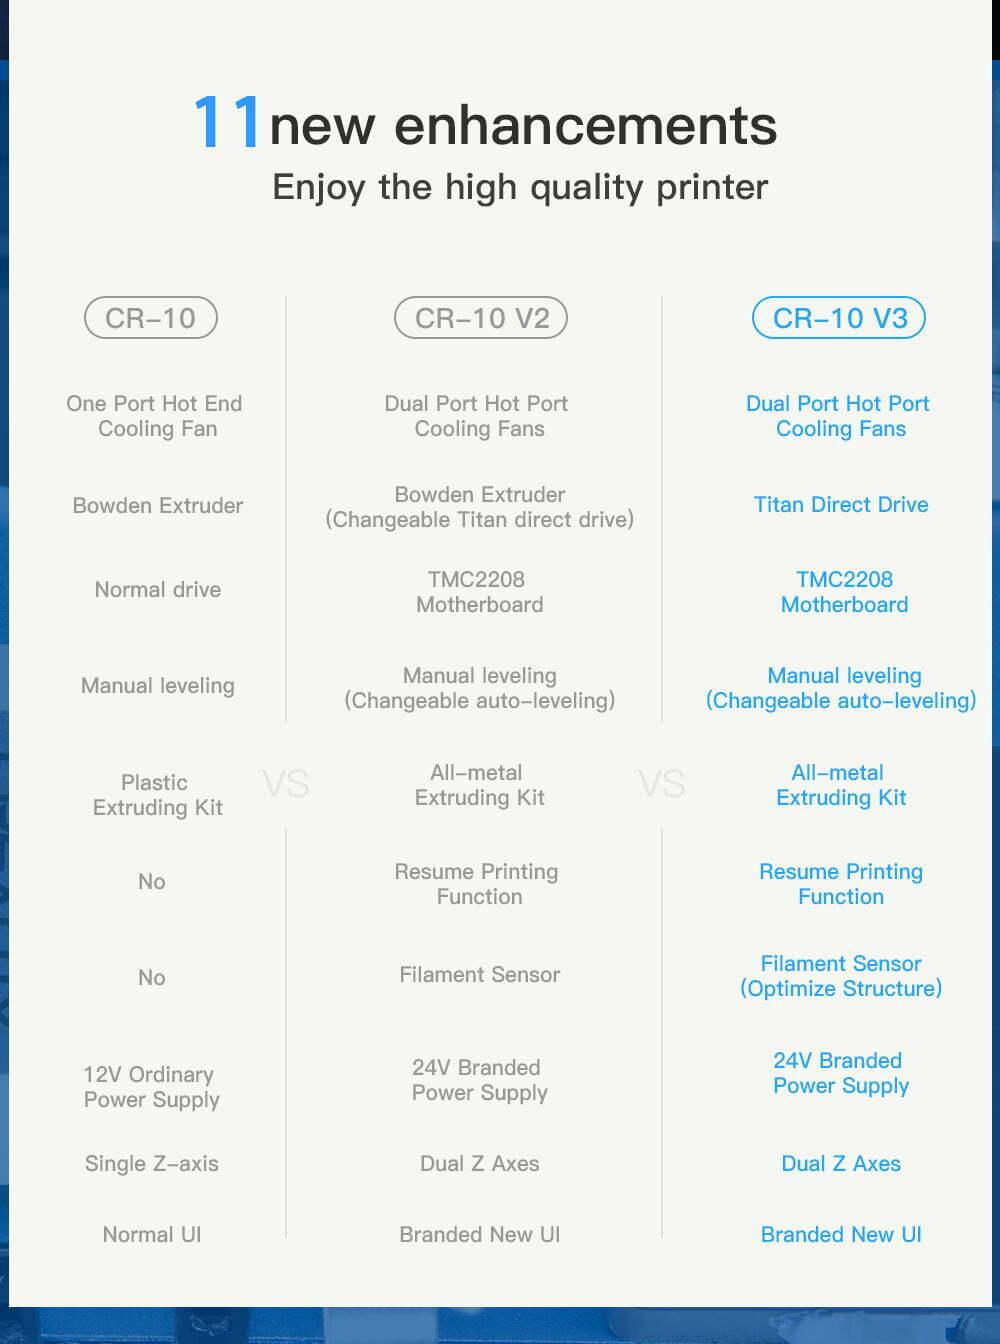 Crality CR-10 V3 sammenligning